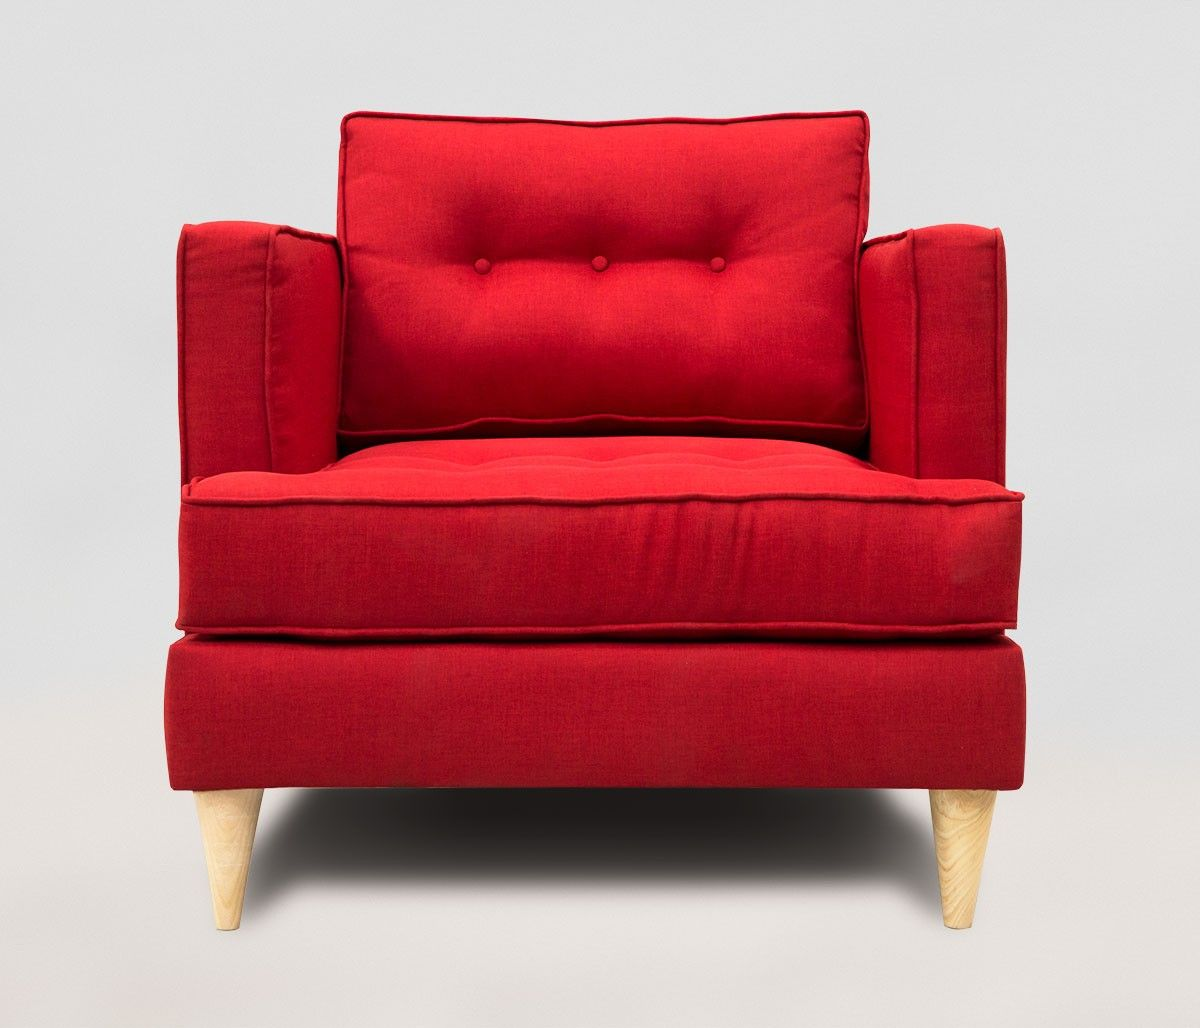 Pin de Ana Reyes en rojo intenso | Pinterest | Sillones, Zapatillas ...